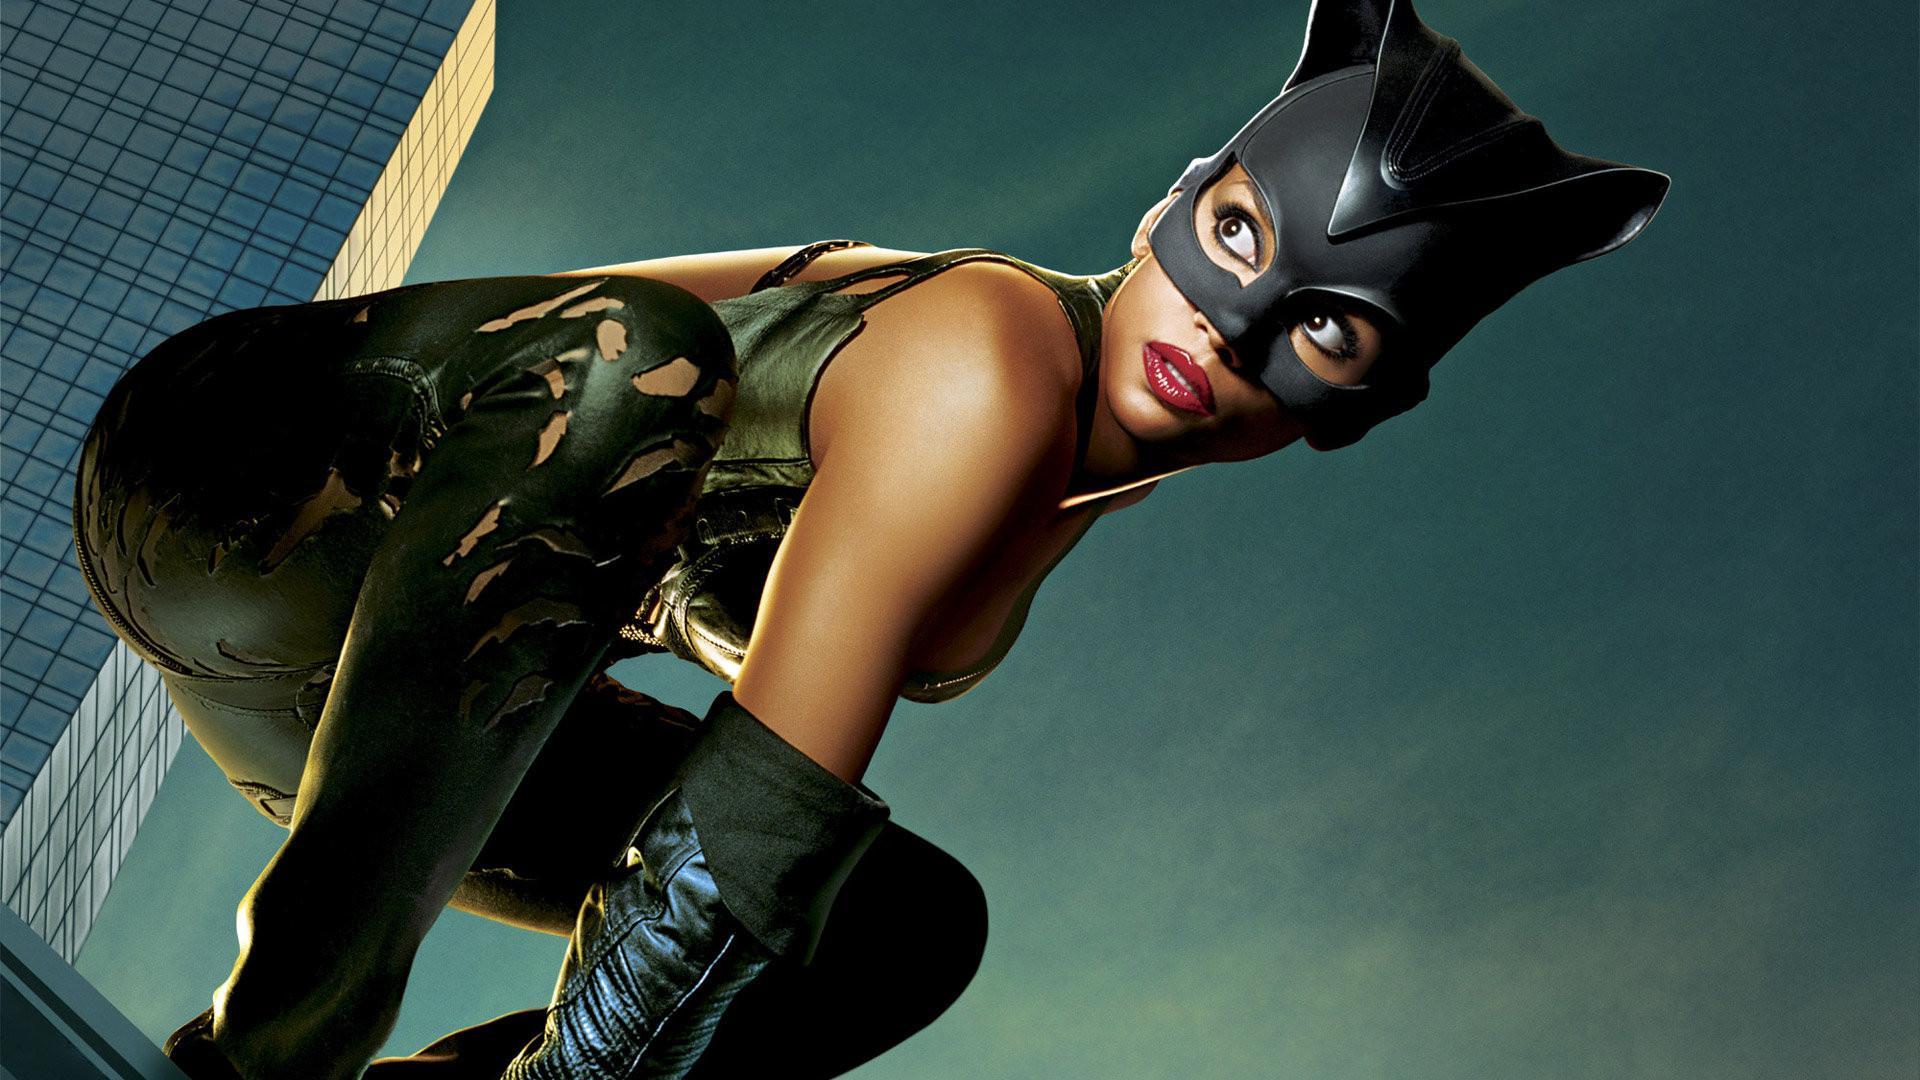 Catwoman halle berry sex lasbein erotic pics